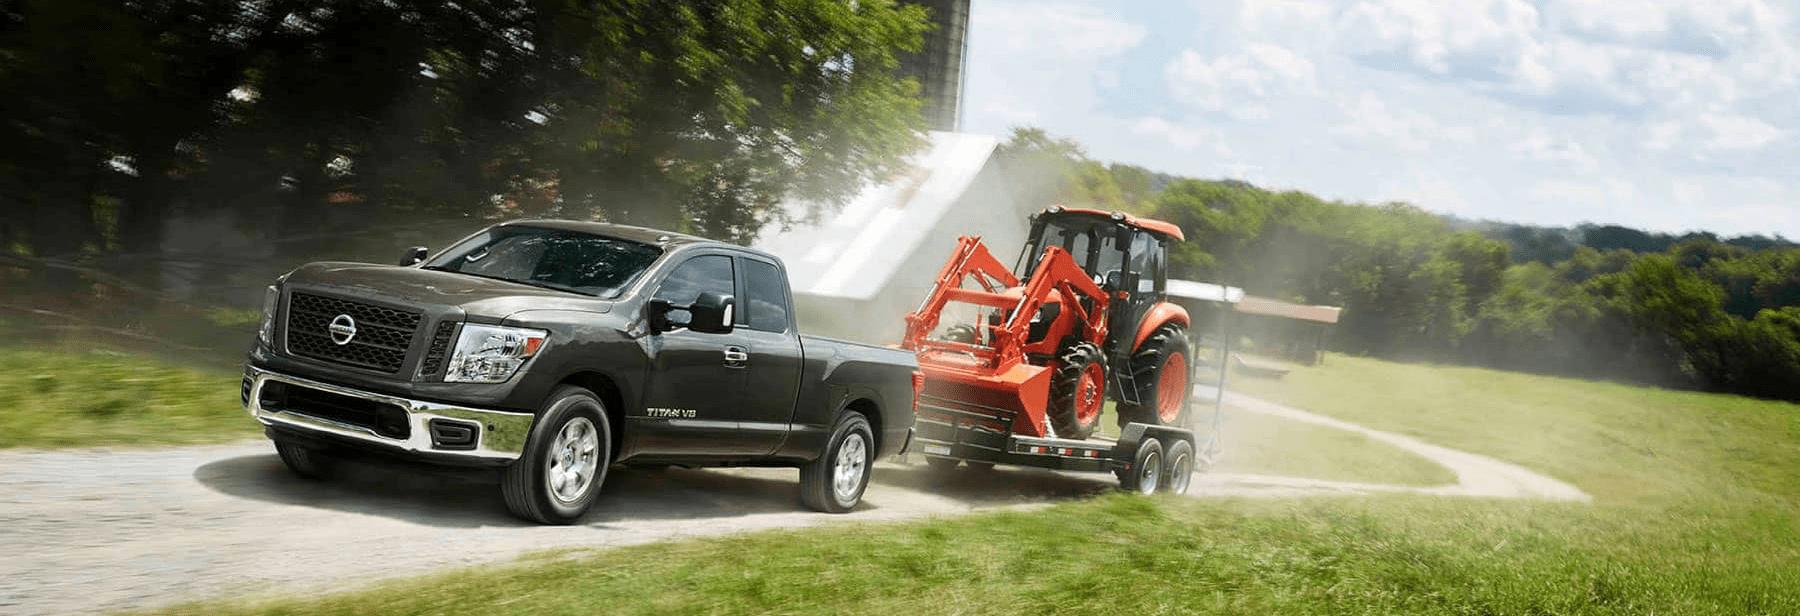 2019 Nissan Truck Pulling Cargo